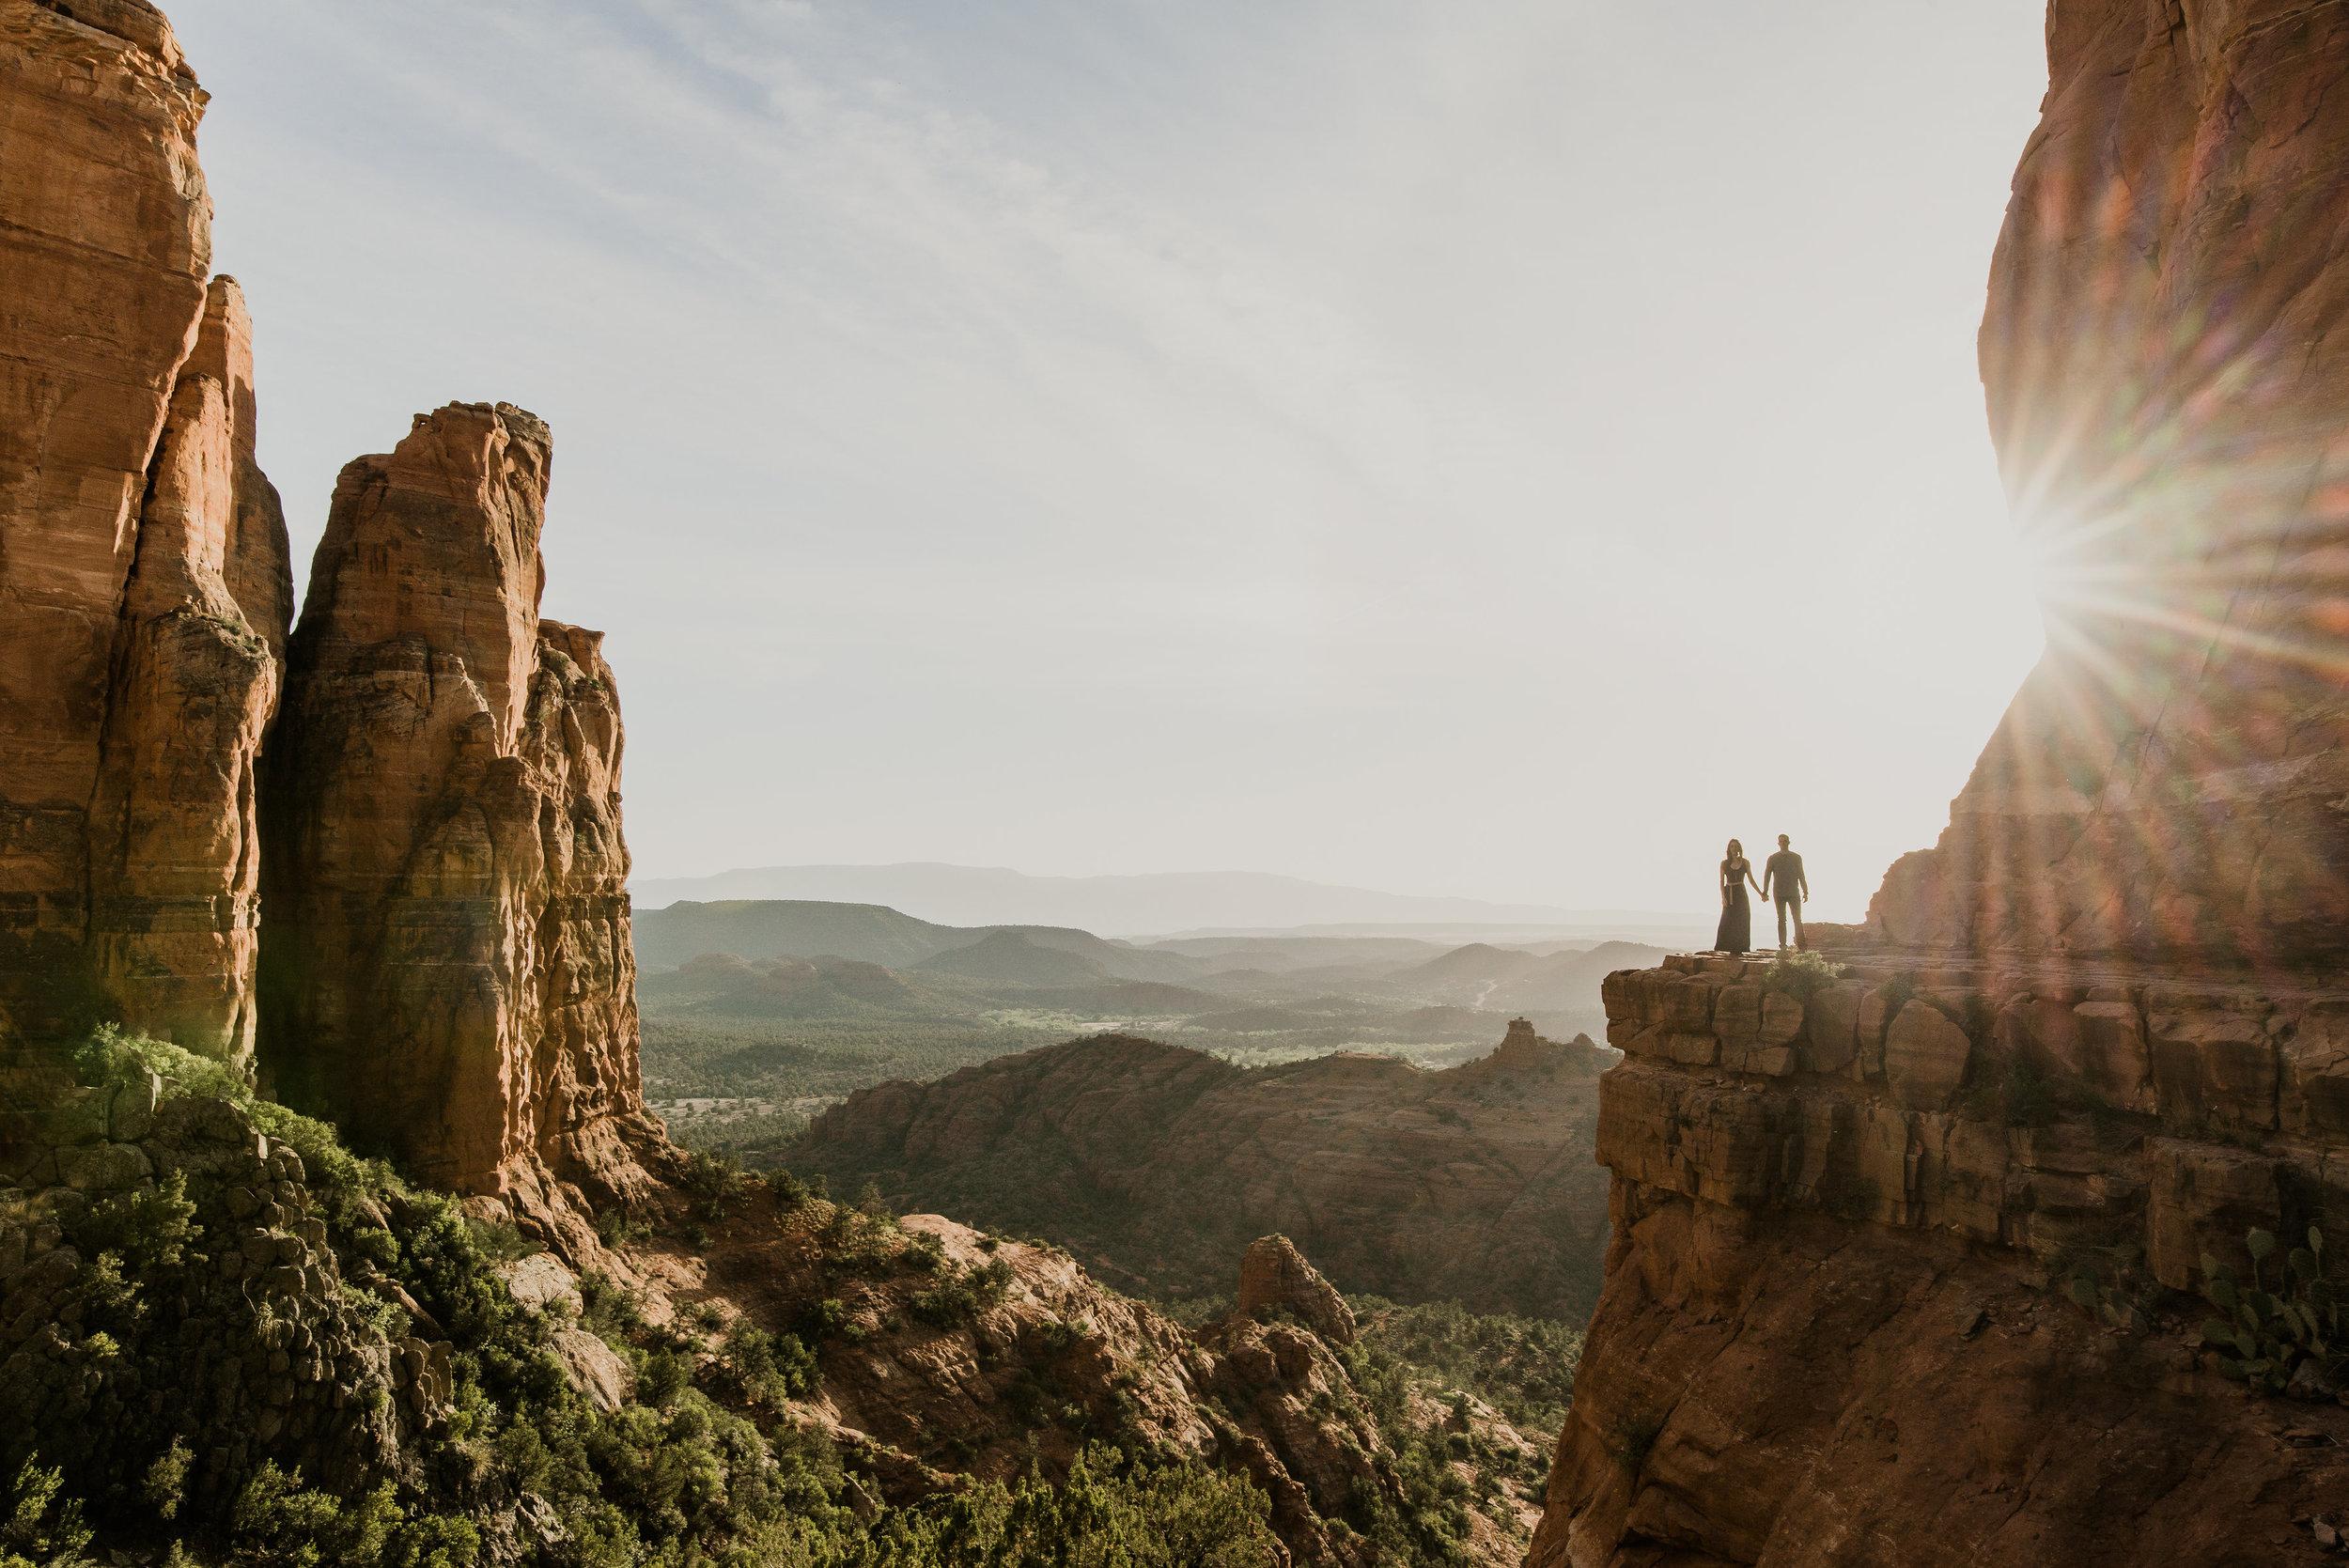 Isaiah-&-Taylor-Photography---Paul-&-Karen-Engagement,-Sedona-Arizona-079.jpg